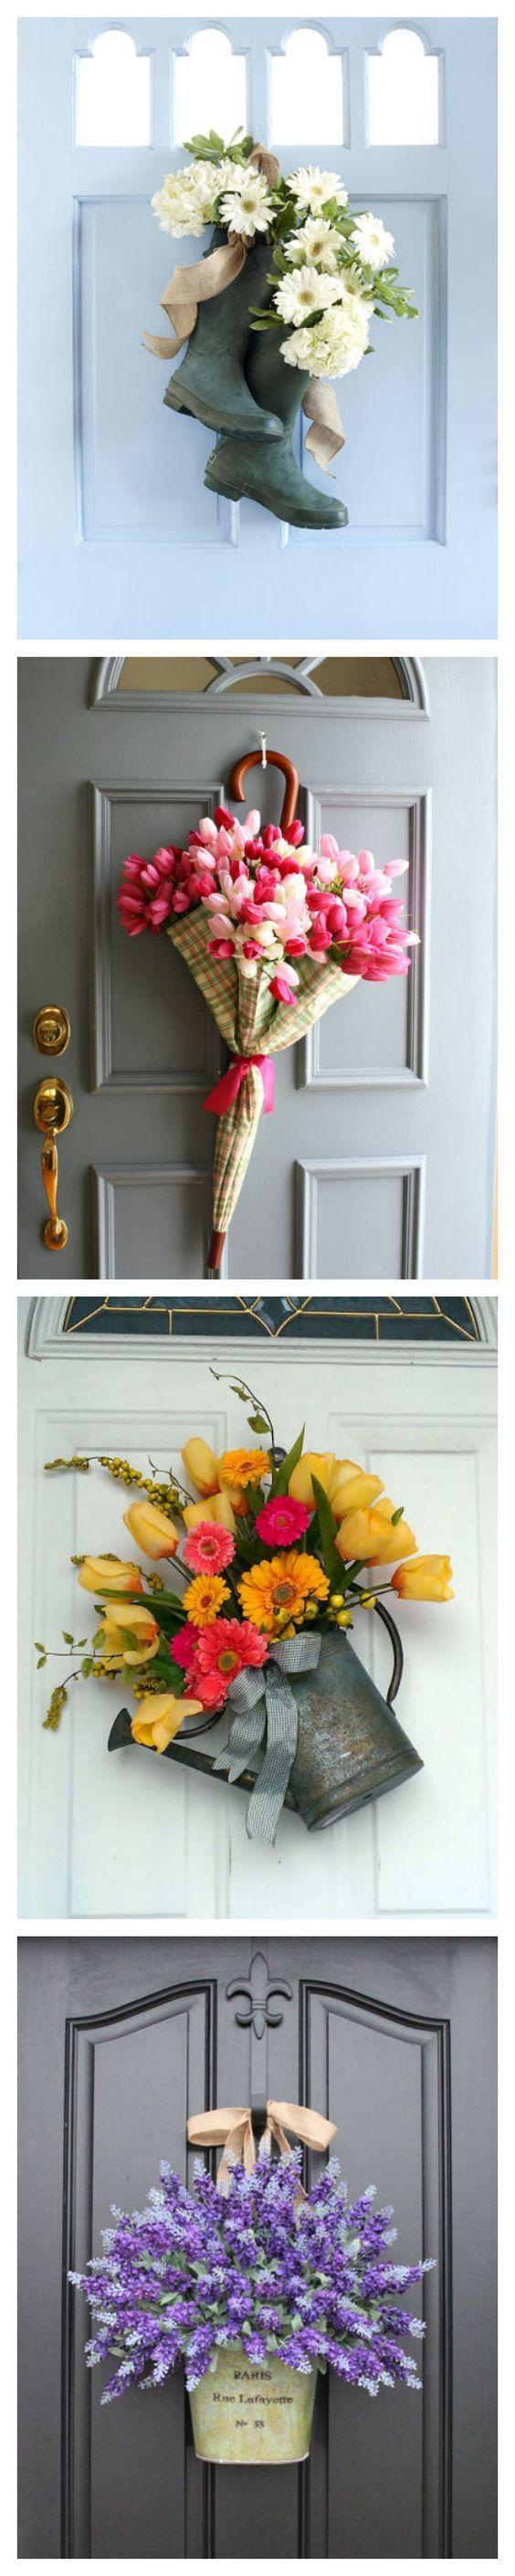 12 Beautiful Spring Decorations to Hang on Your Door That Aren't Wreaths